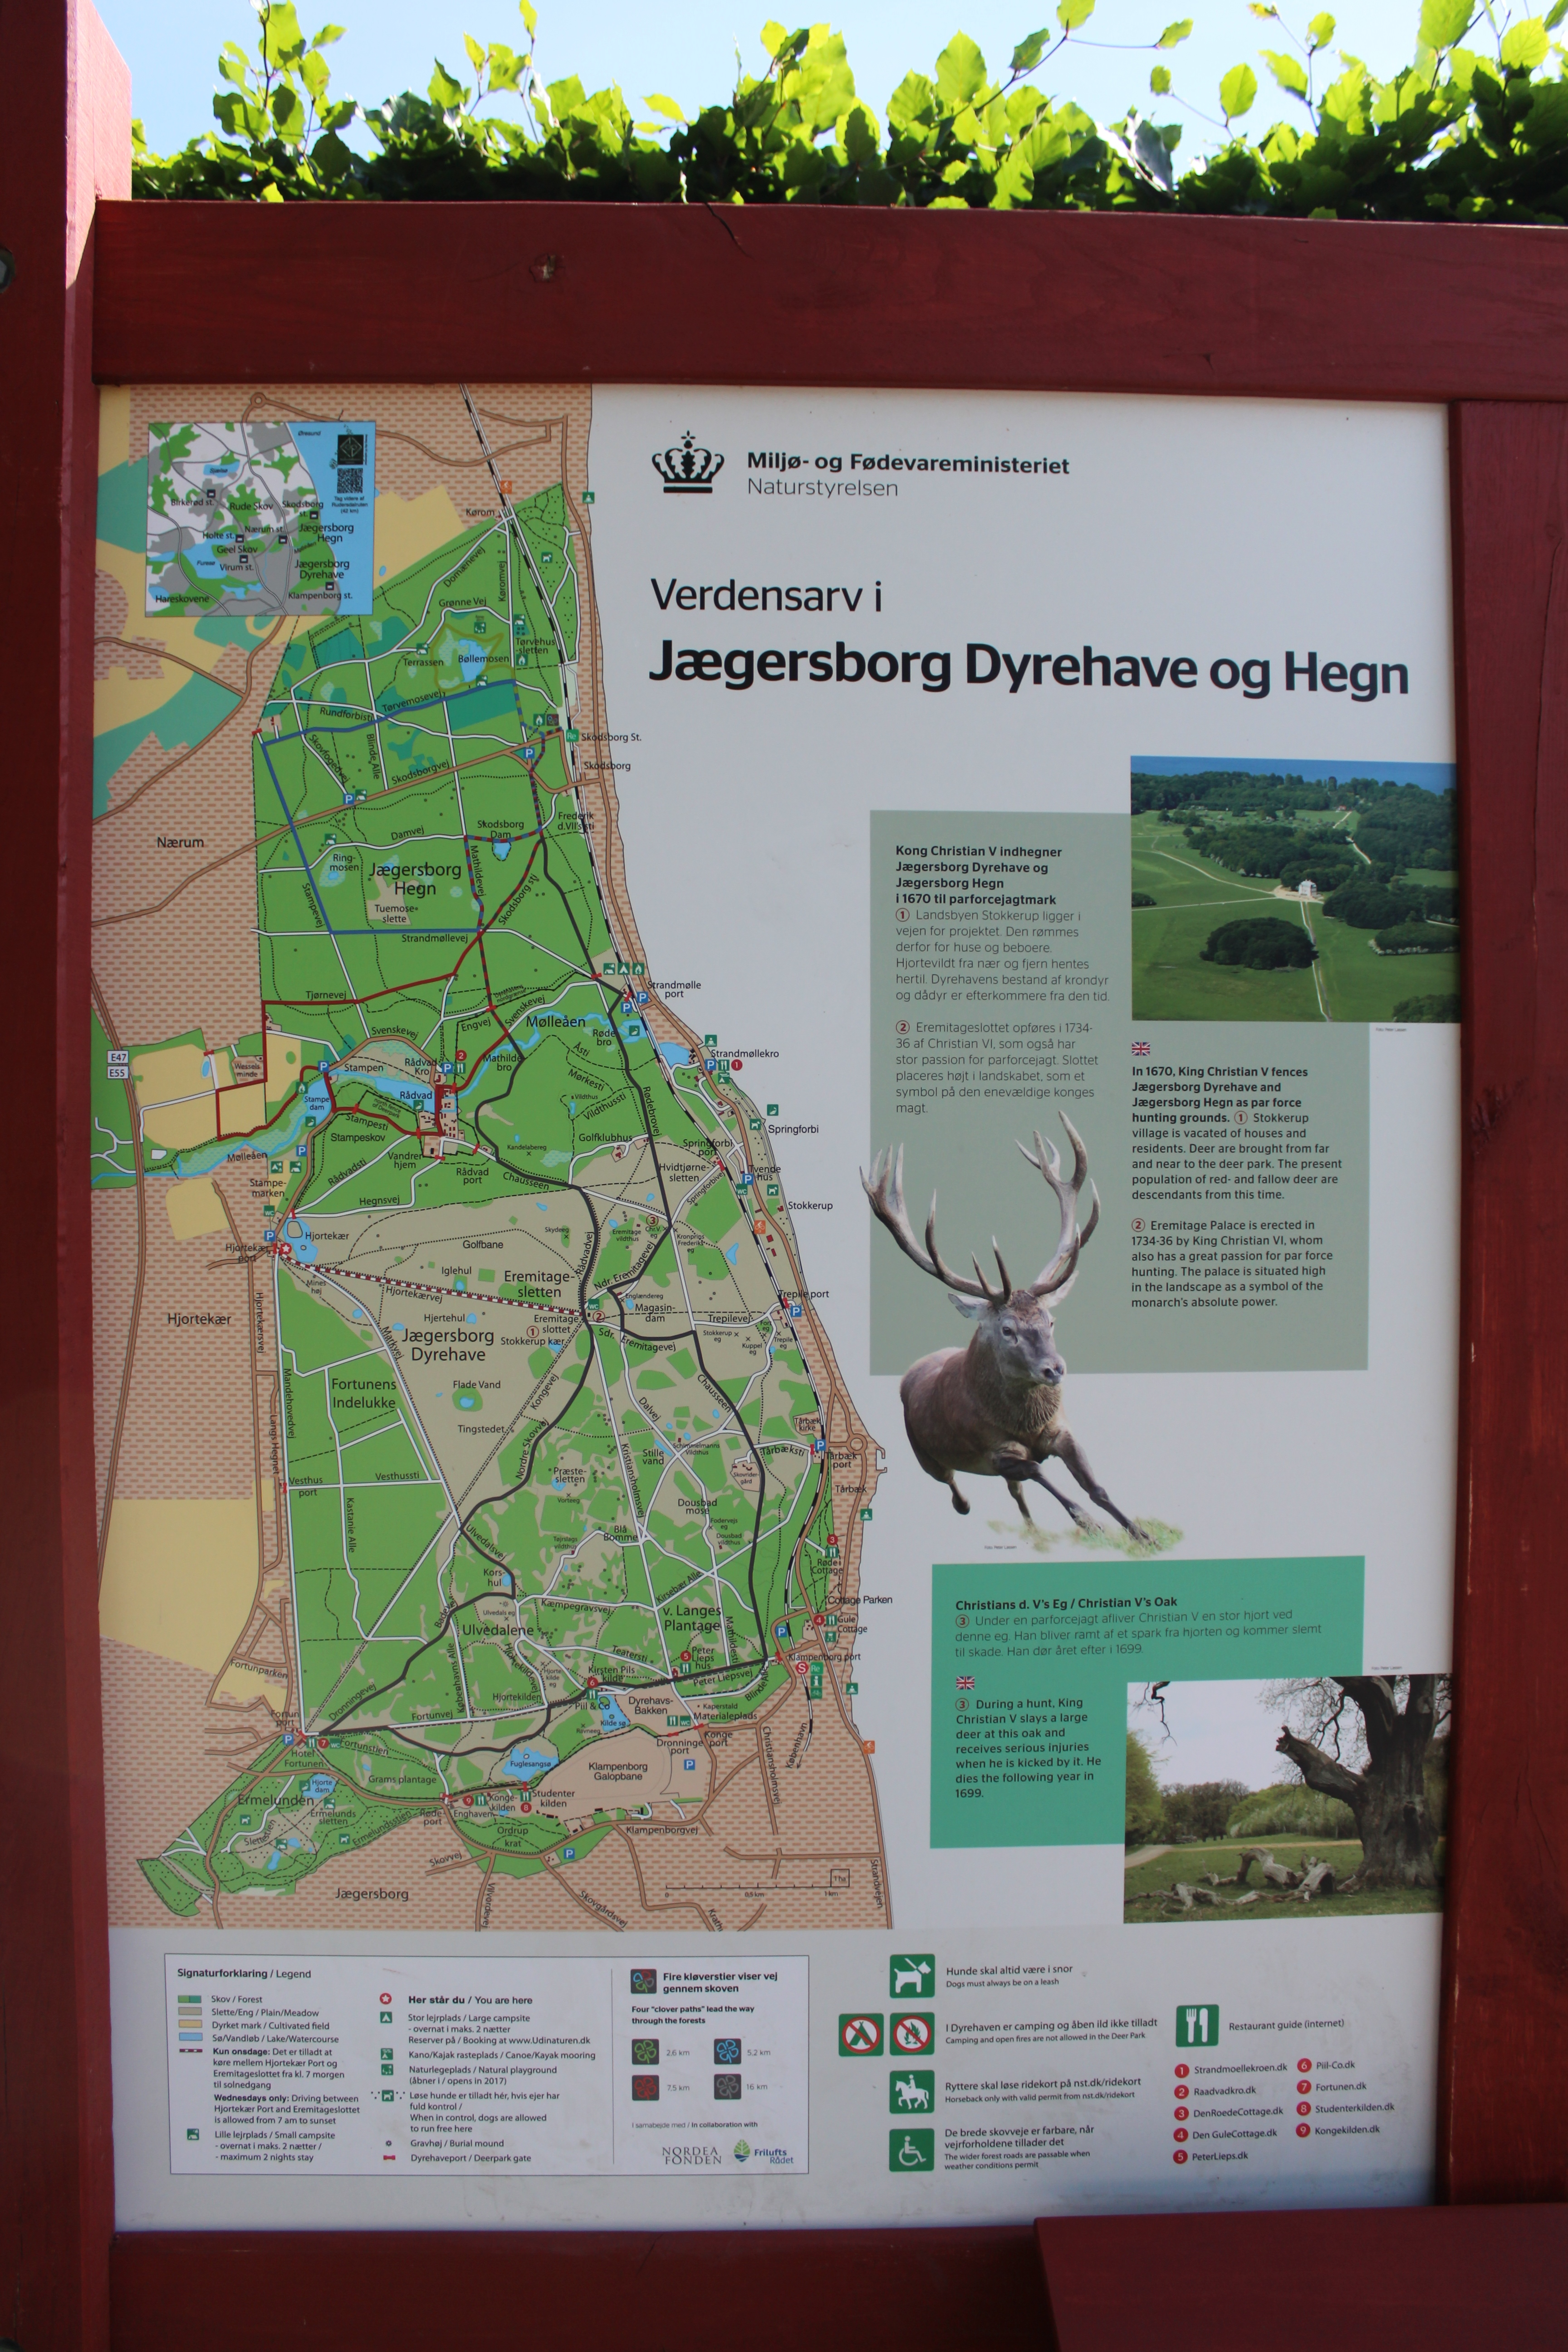 www dyrehaven klampenborg